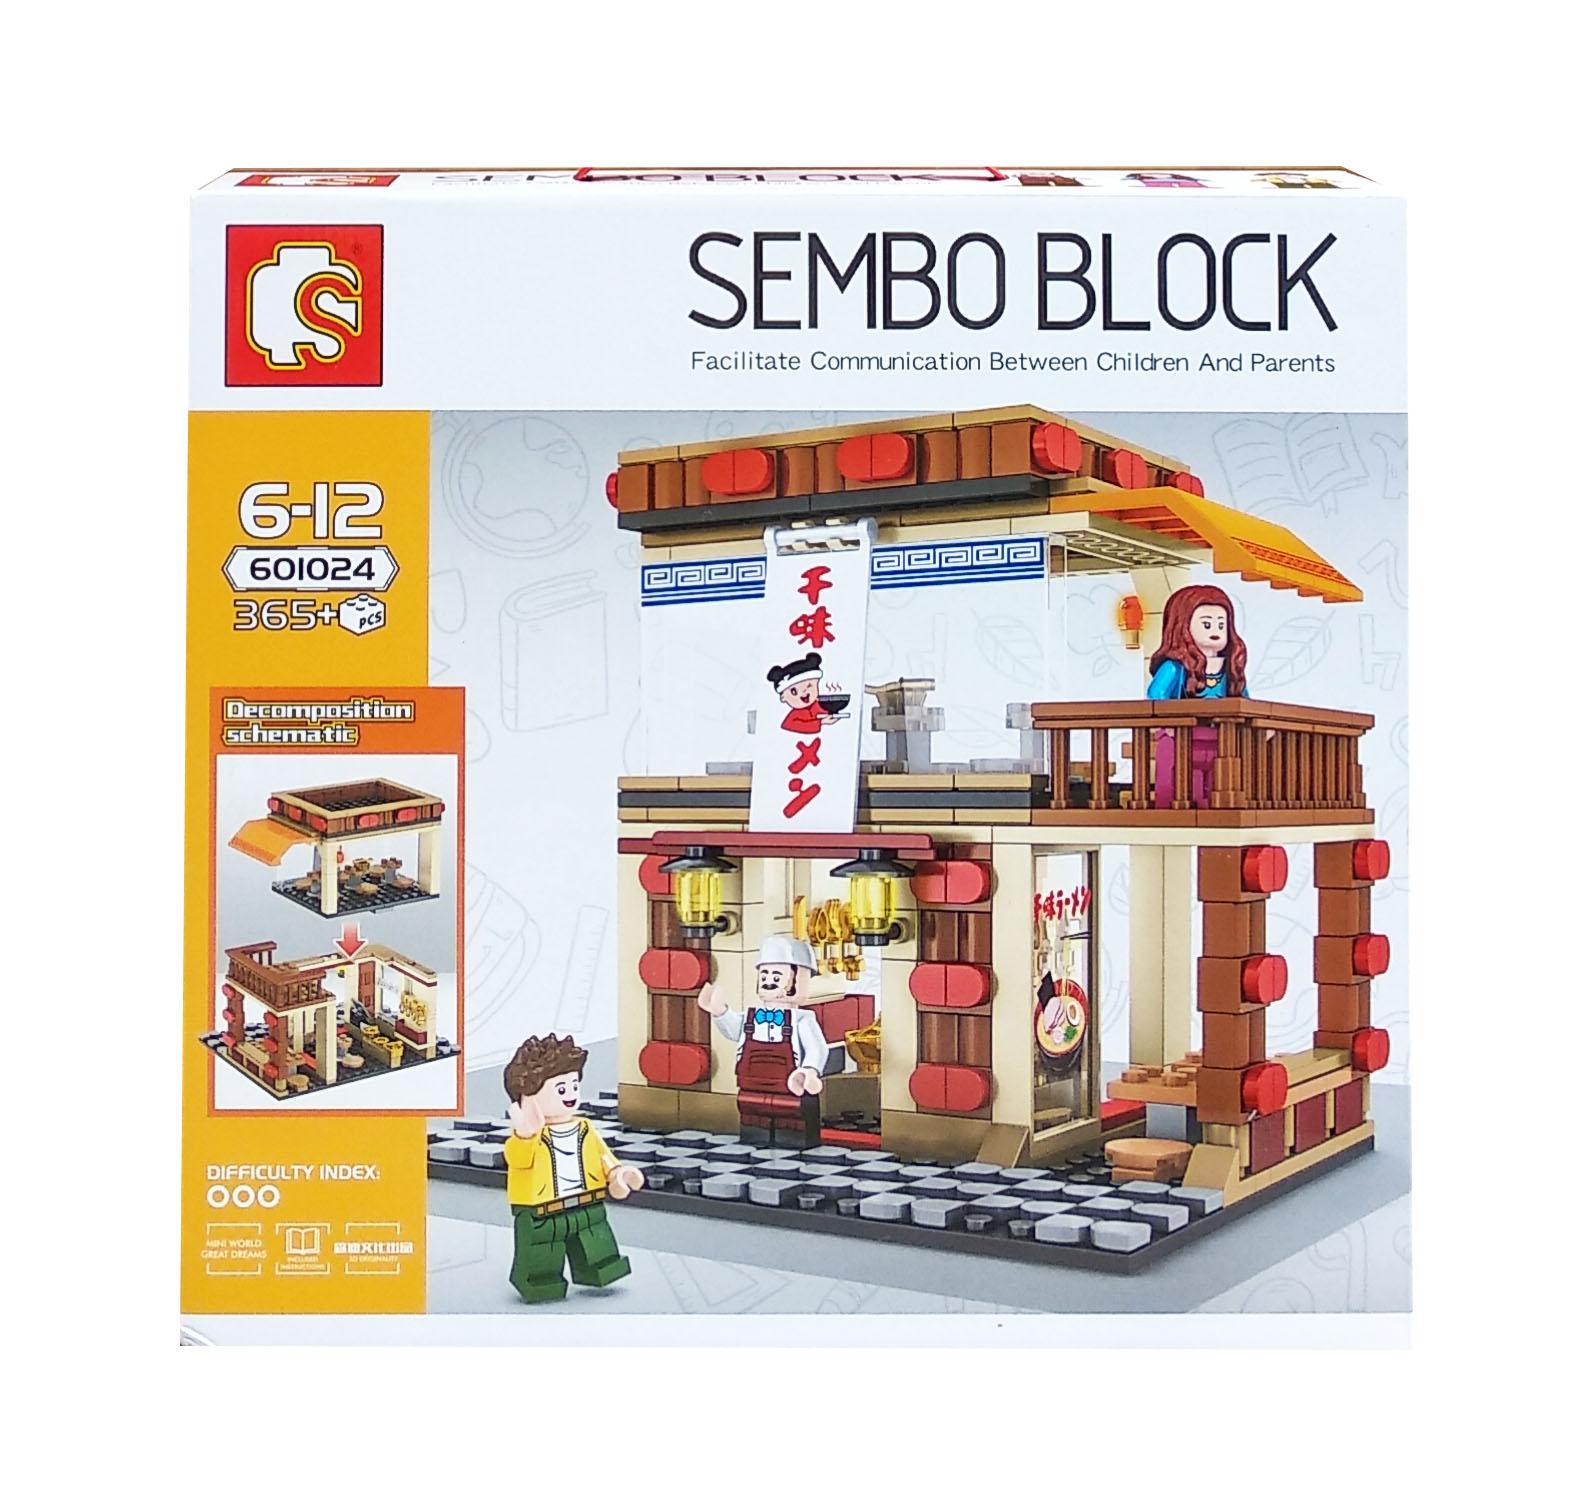 toko mainan online SEMBO BLOCK RESTO 365PCS - 601024